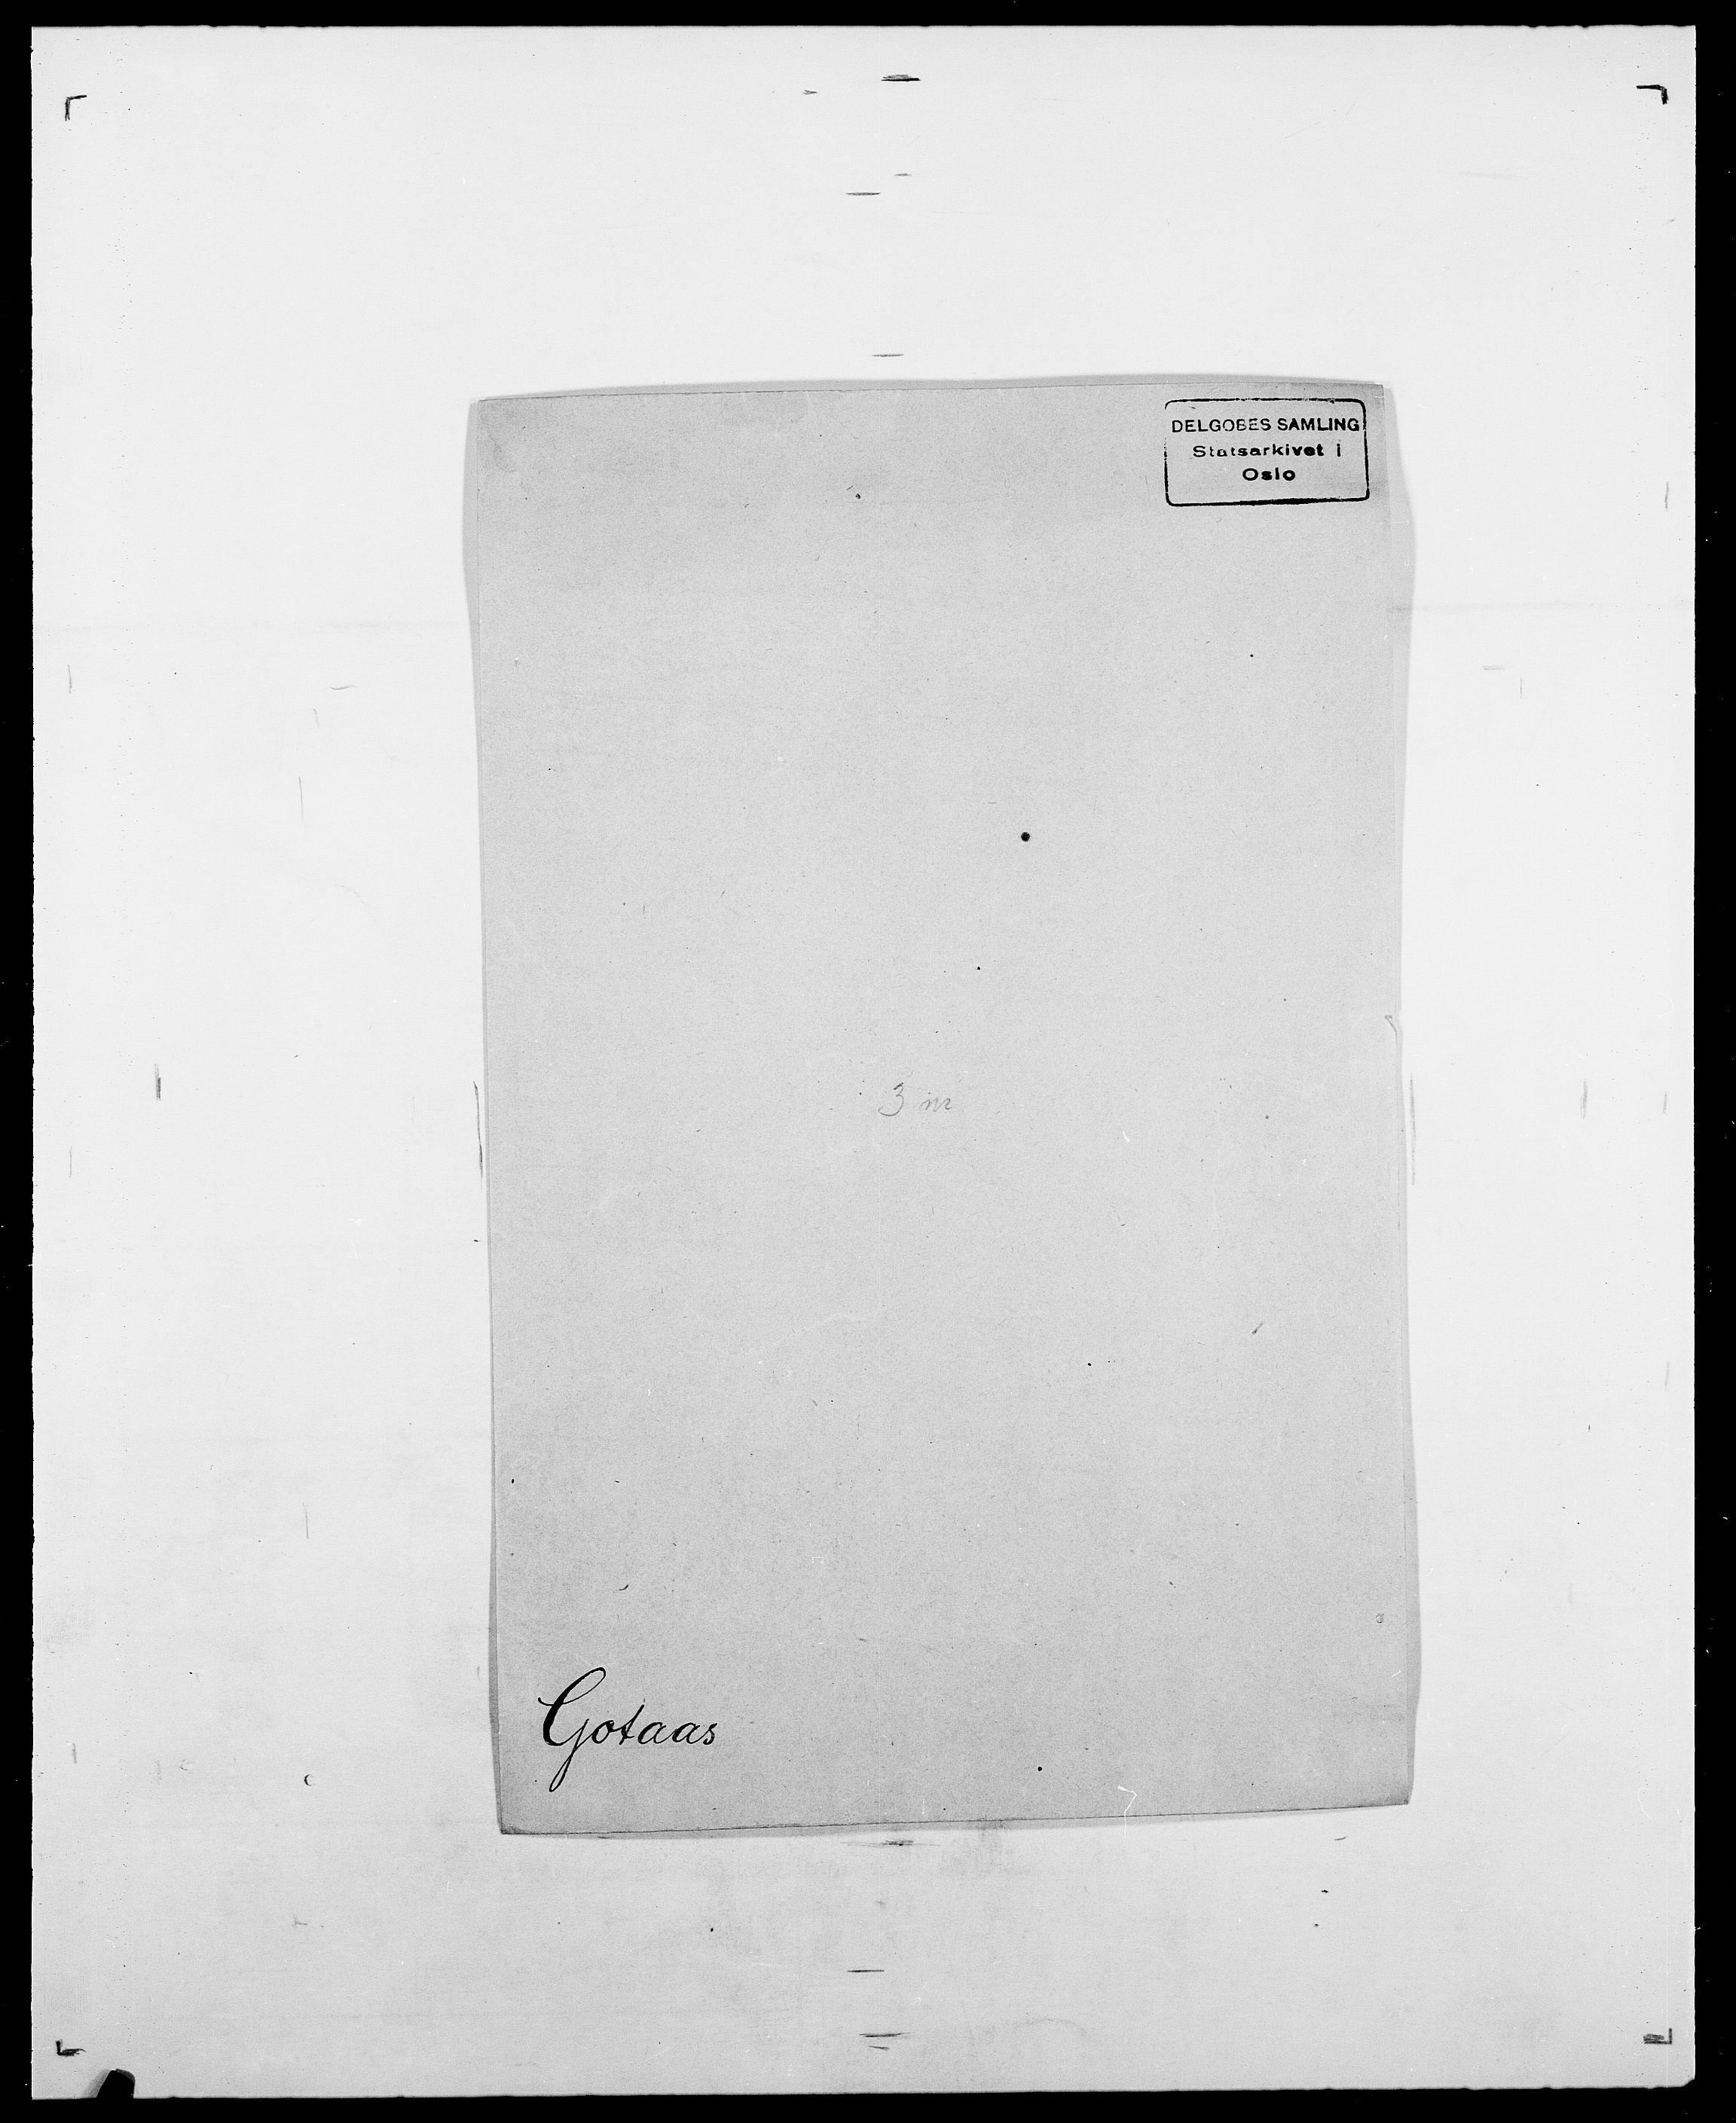 SAO, Delgobe, Charles Antoine - samling, D/Da/L0014: Giebdhausen - Grip, s. 395